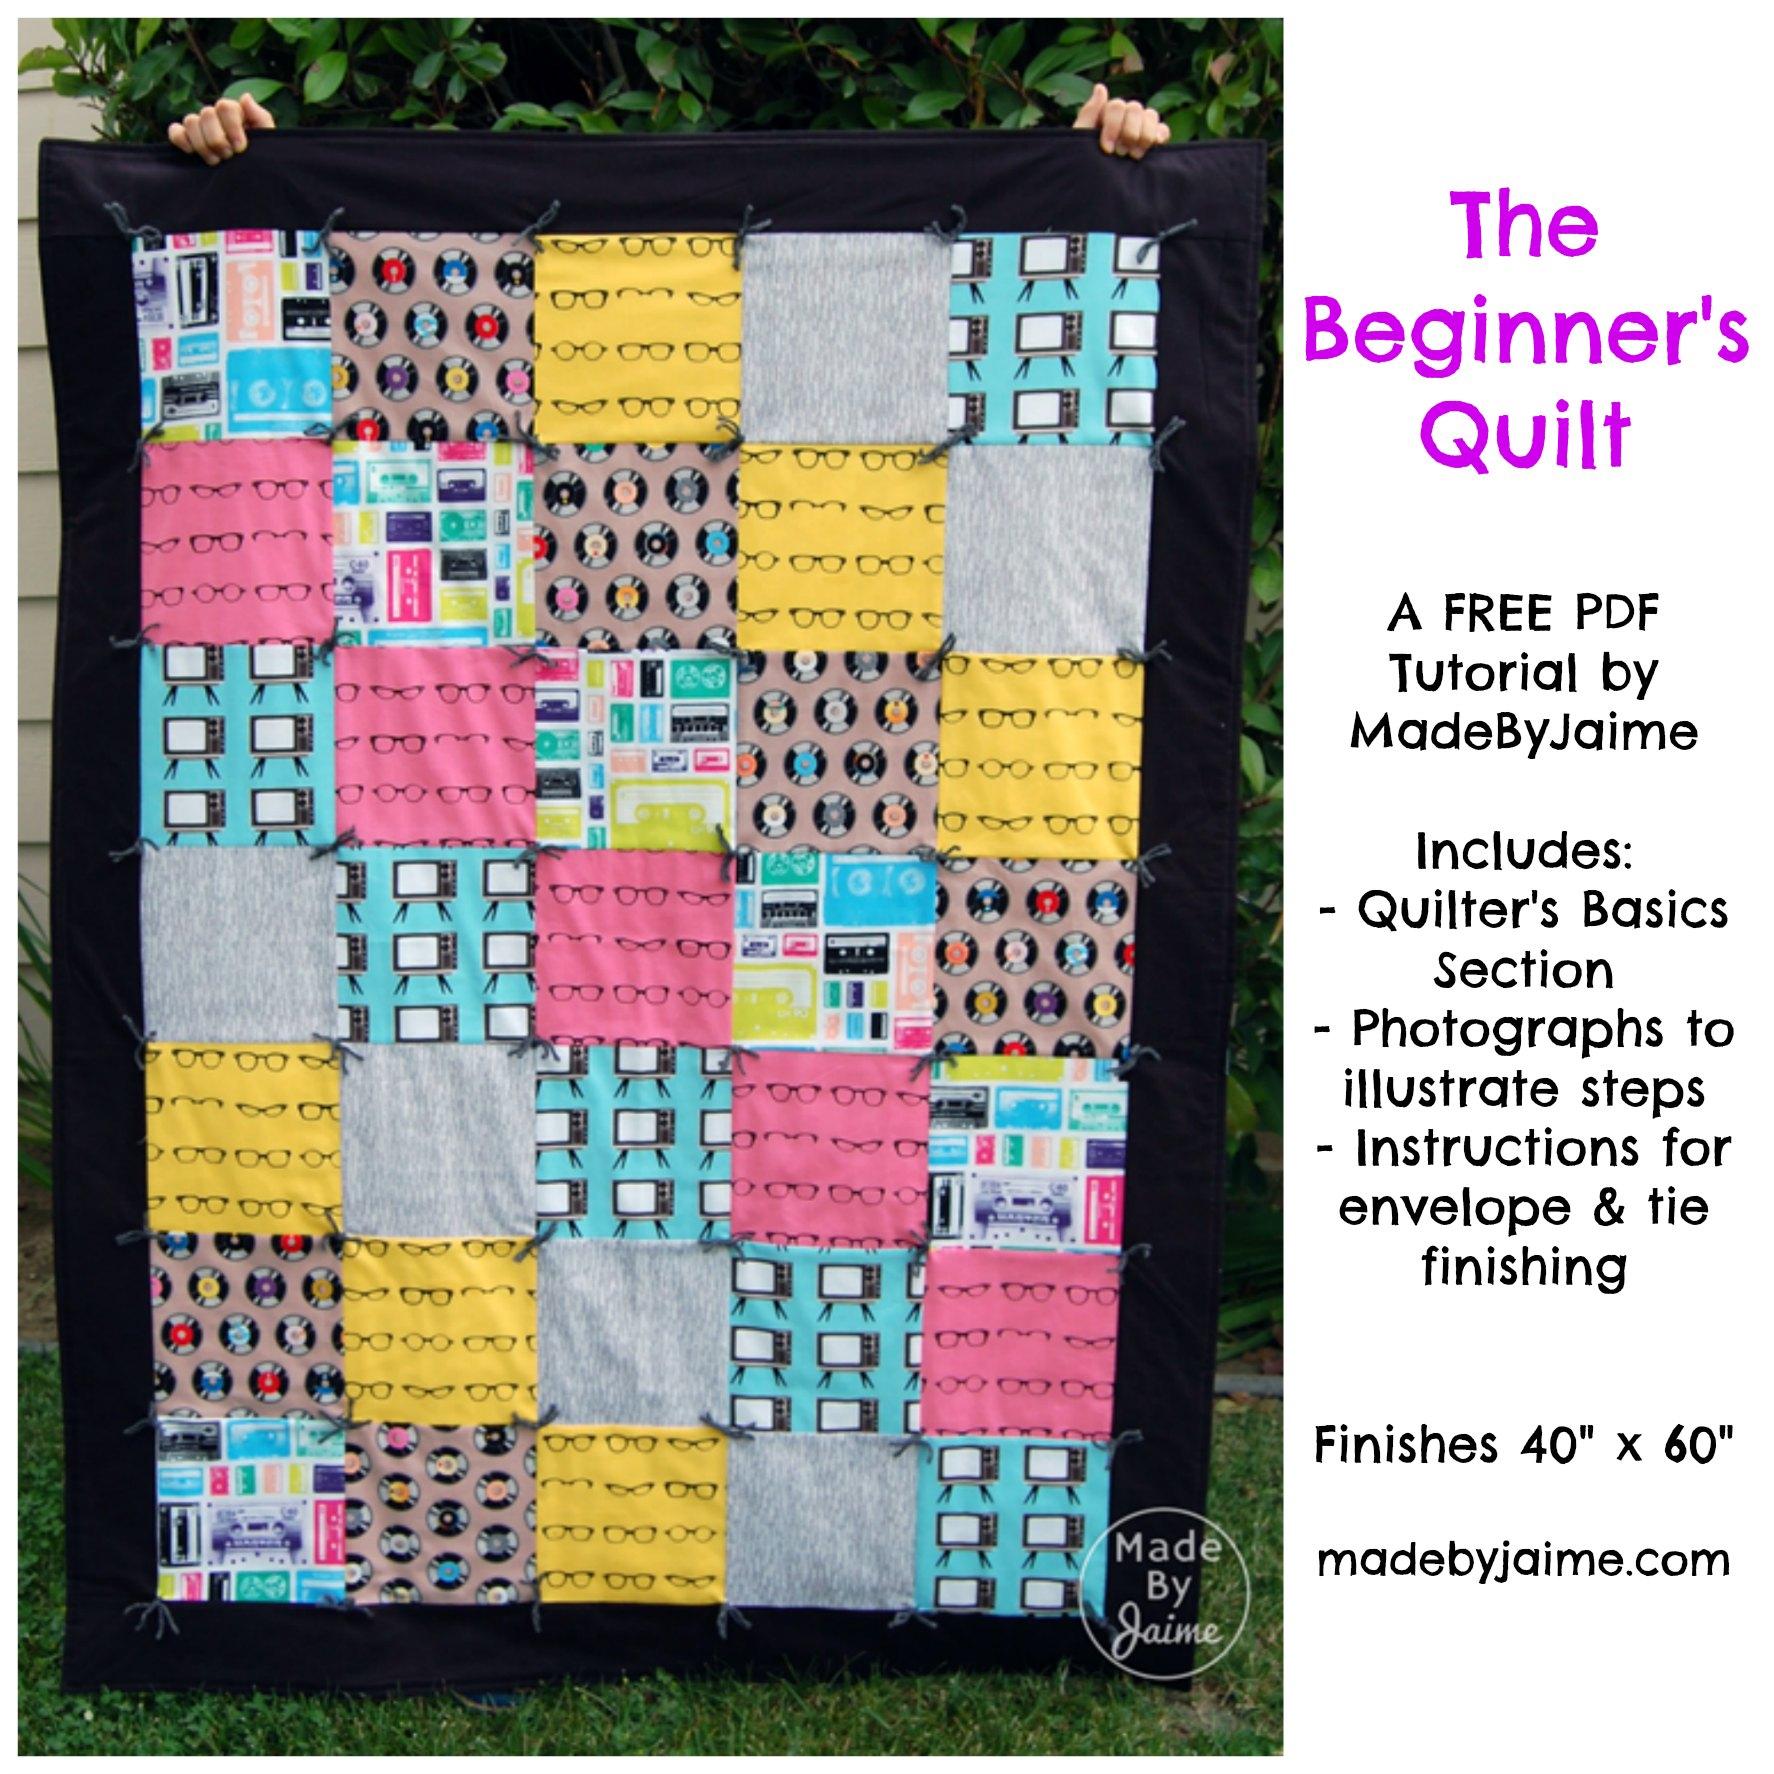 Free PDF Beginner's Quilt Tutorial | MadeByJaime